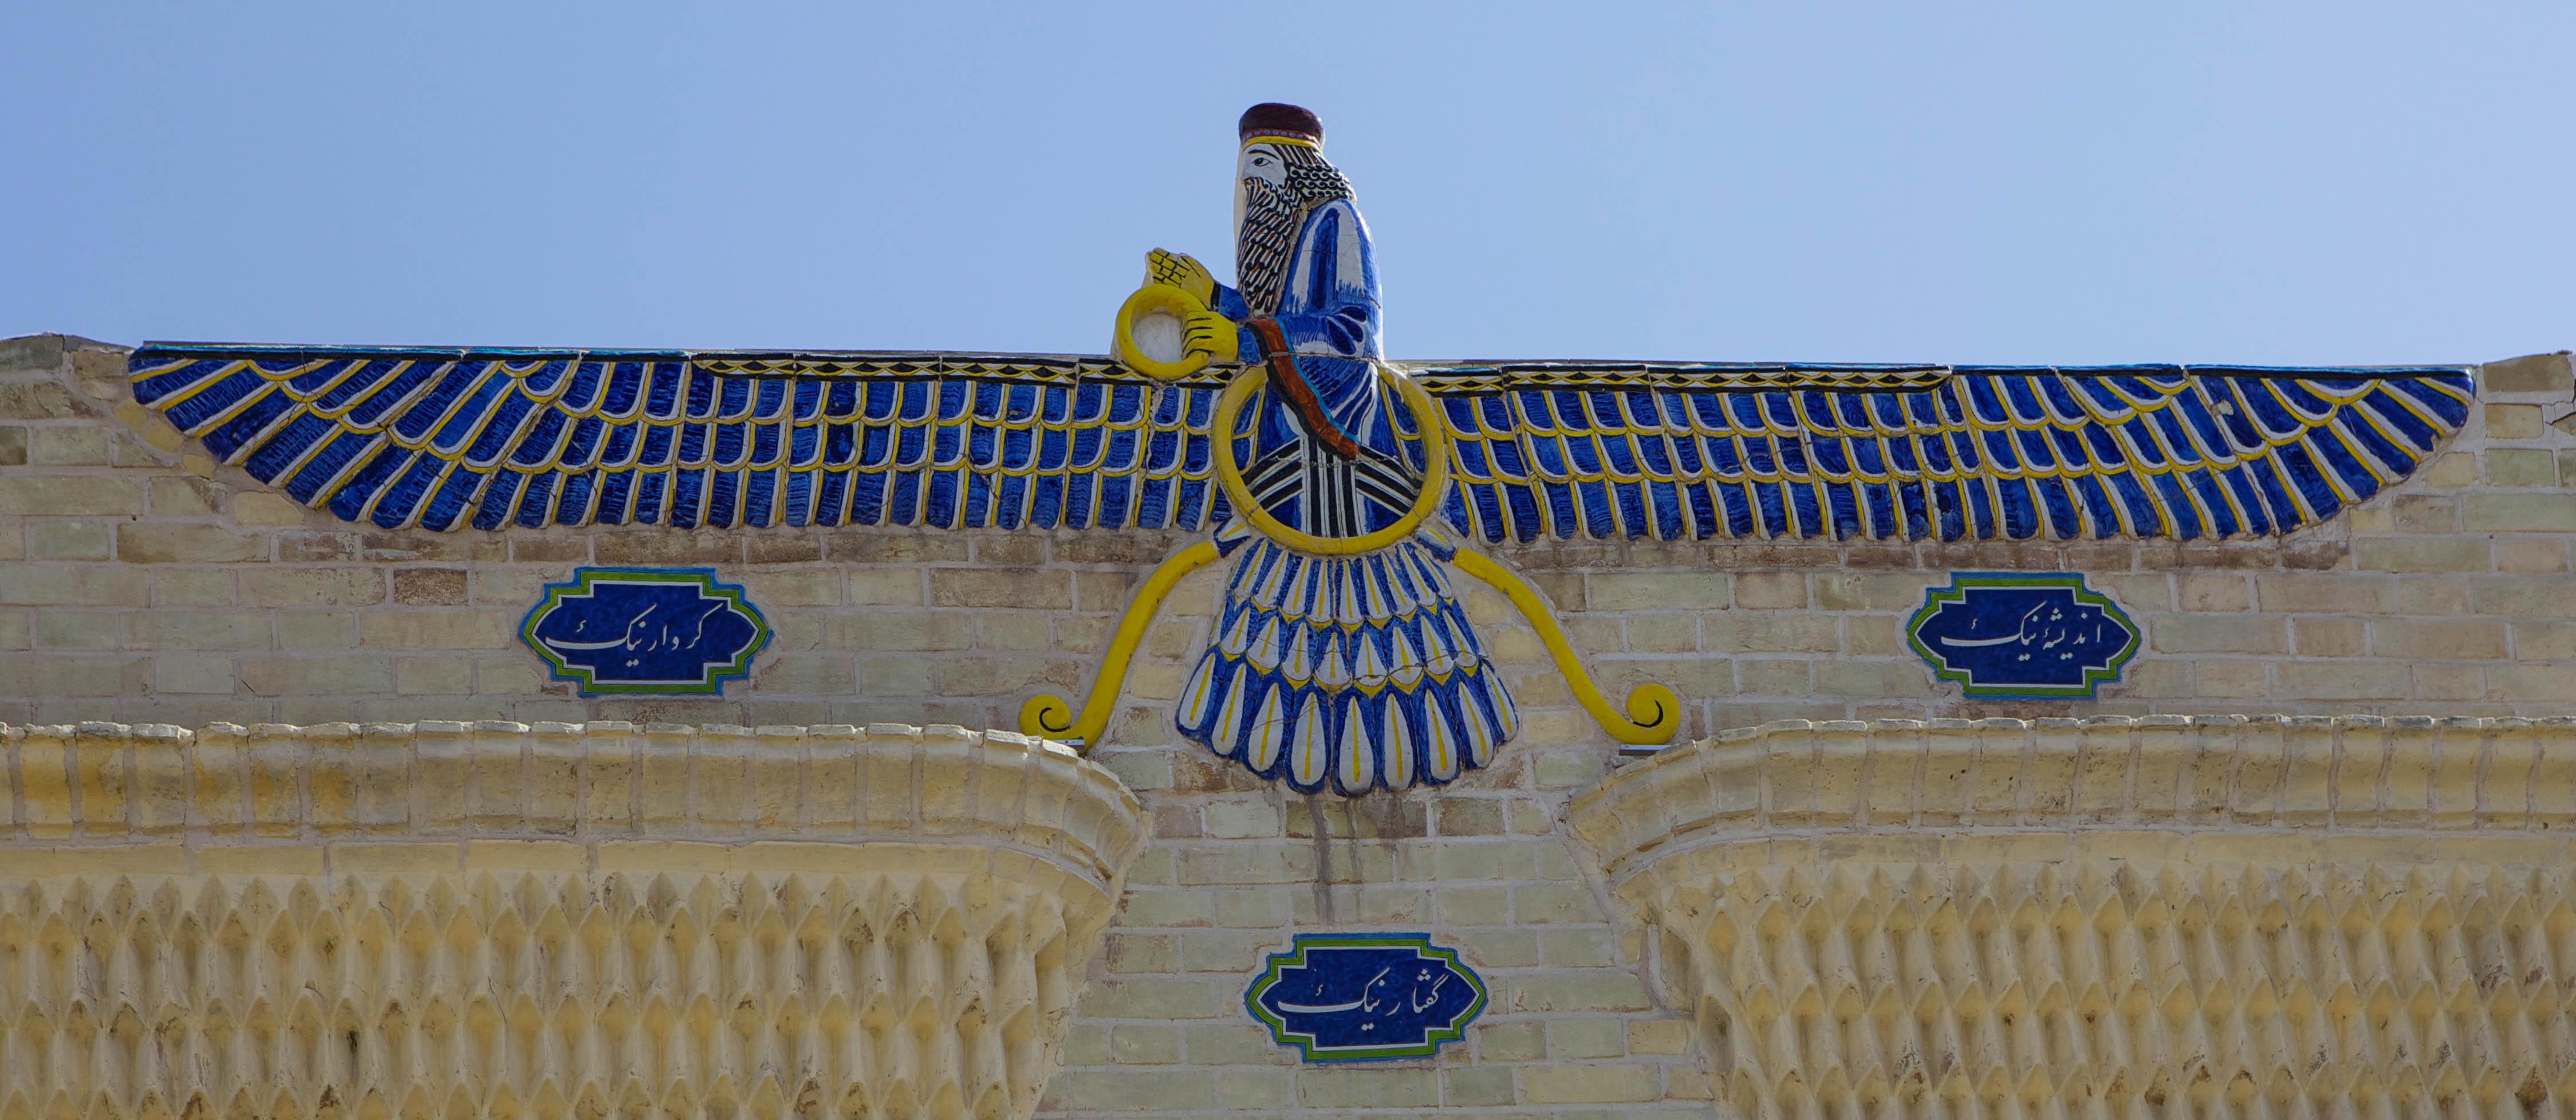 A Faravahar Symbol In A Fire Temple Illustration Ancient History